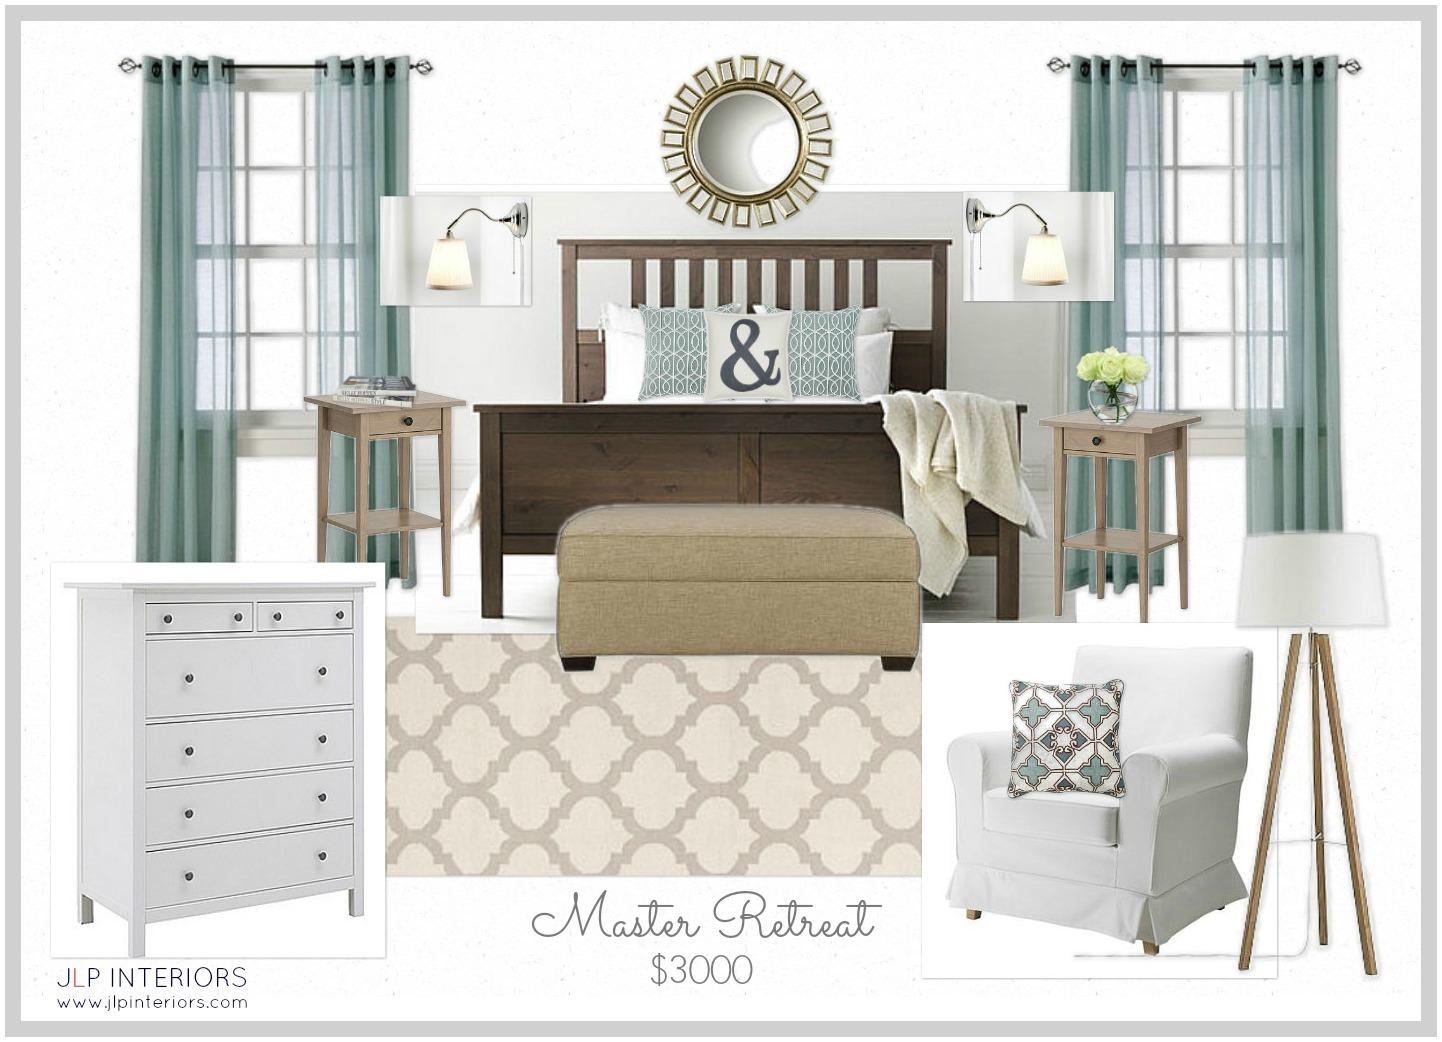 Attic Floor Plan Home With Baxter Mood Board Monday Master Bedroom Retreat